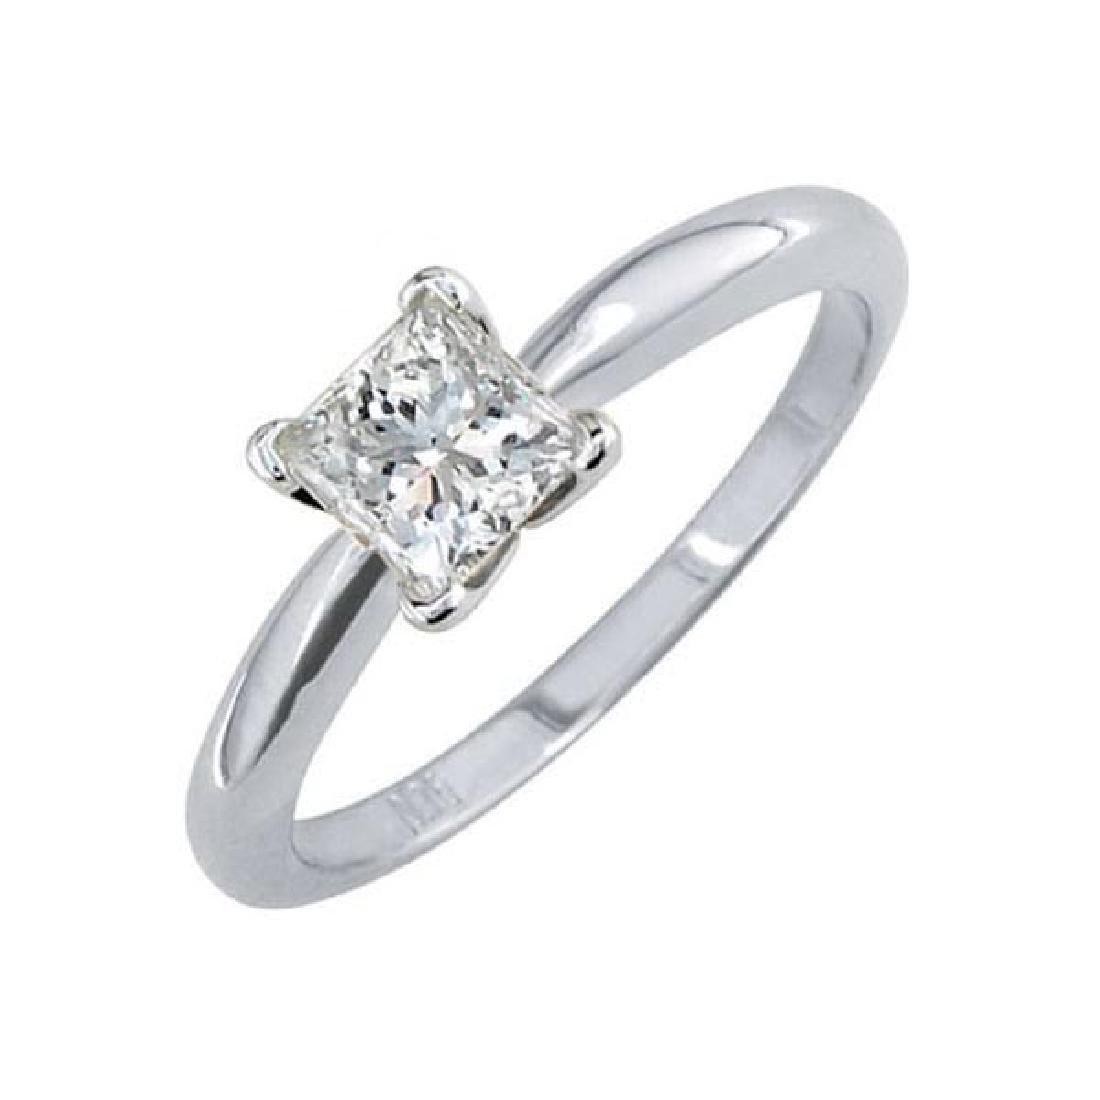 Certified 1 CTW Princess Diamond Solitaire 14k Ring E/S